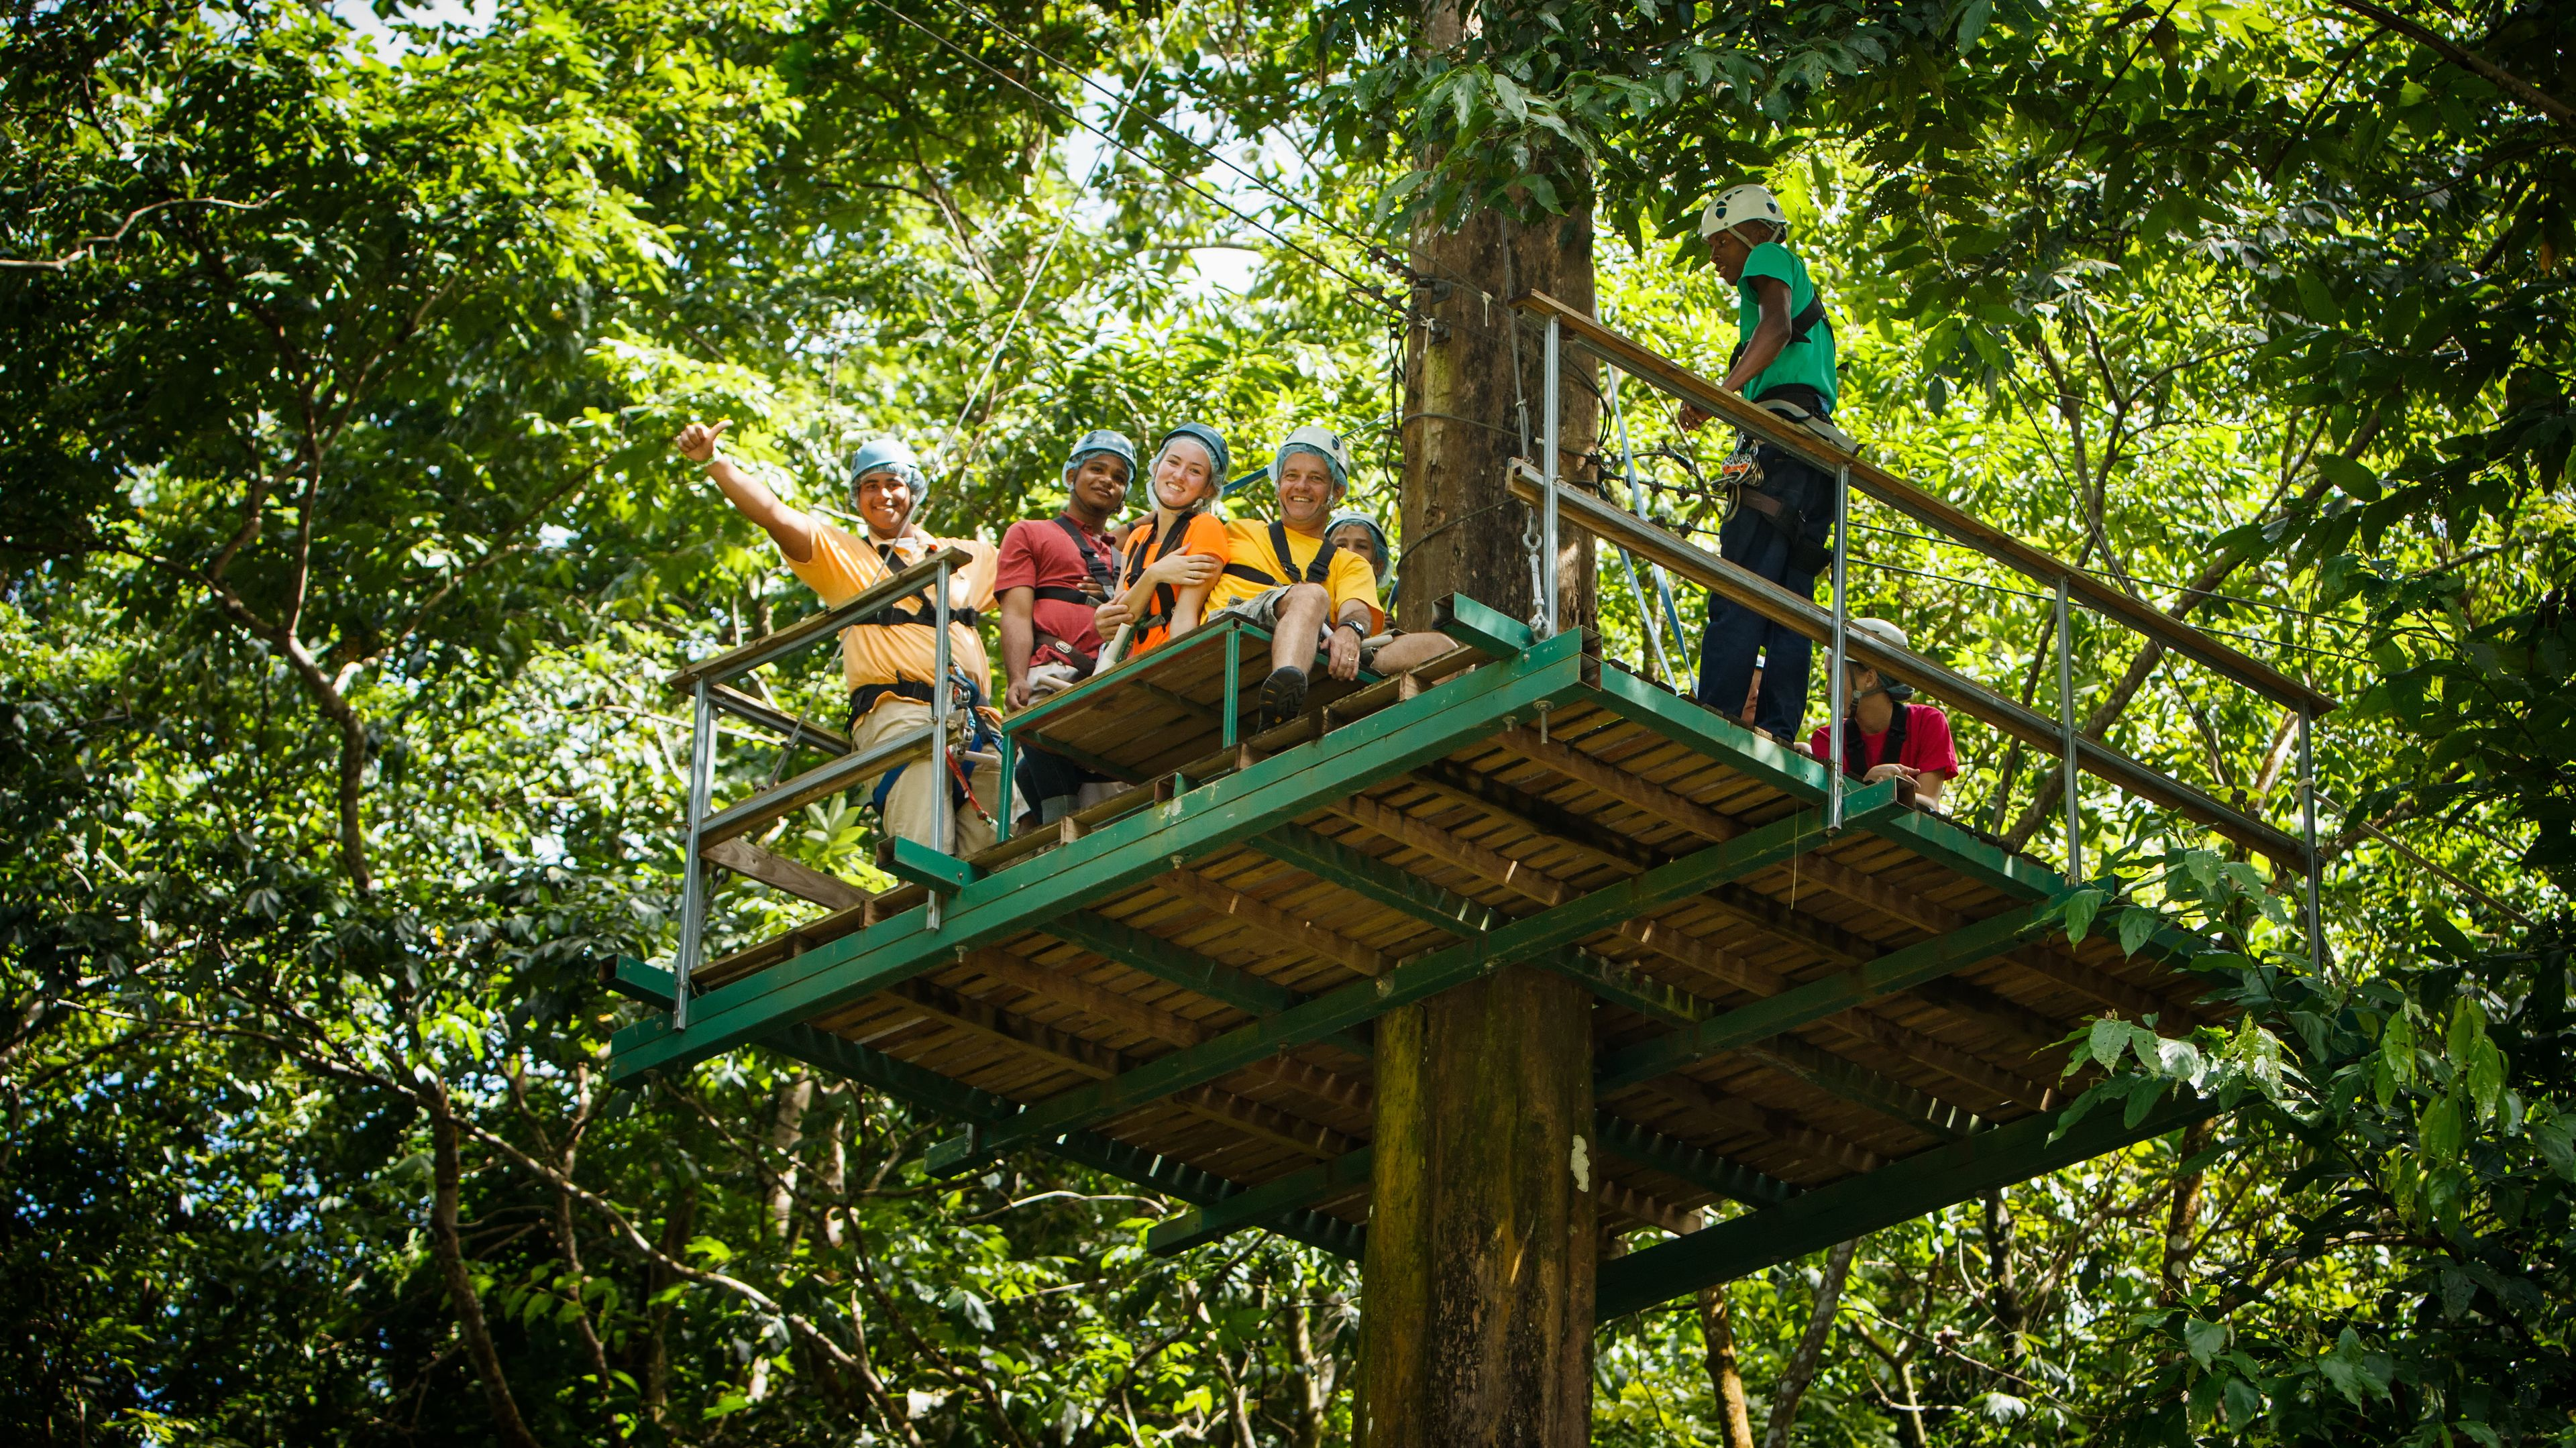 Ultimate 3 Rainforest Adventure; Hike, Tram Ride & Zipline